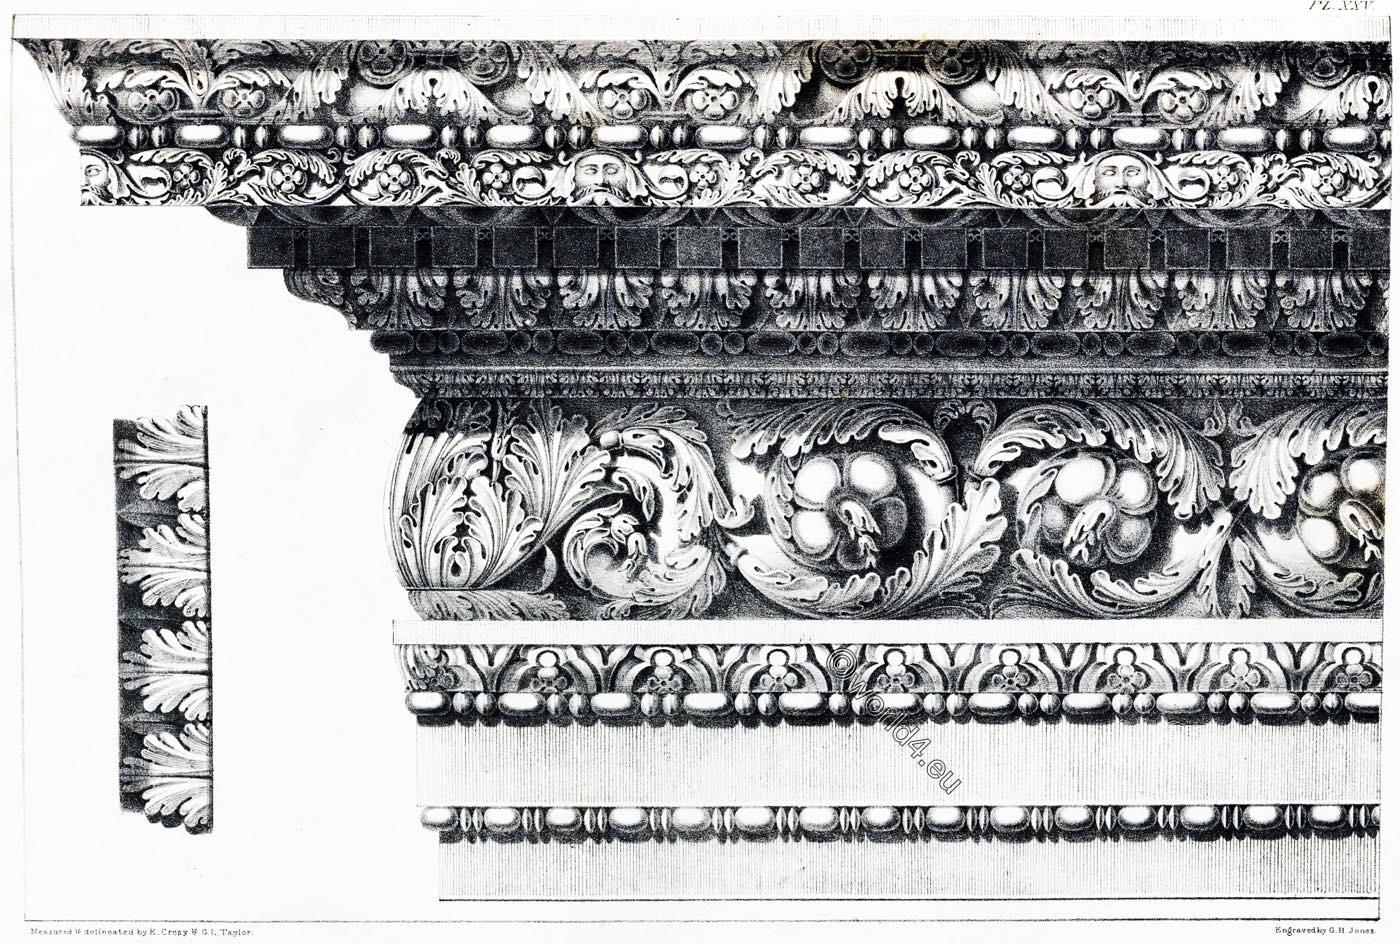 Entablature, Goldsmith, Arch, Rome, Capital, Ornament, Decoration, Architecture, antiquities,